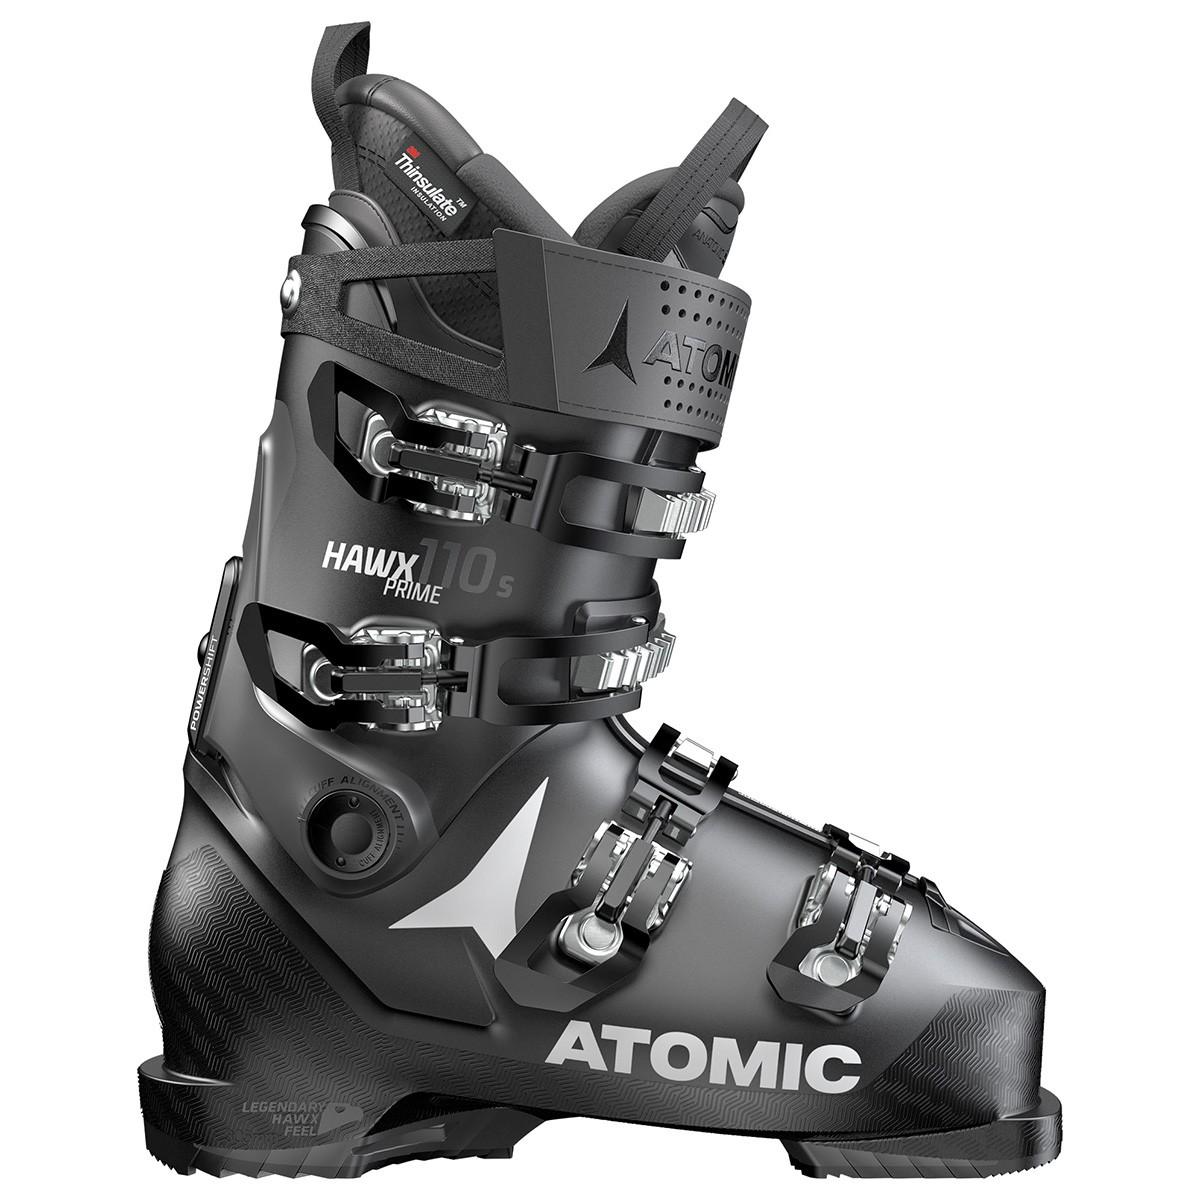 watch 52035 9e417 Ski boots Atomic Hawx Prime 110 S - Allround top level